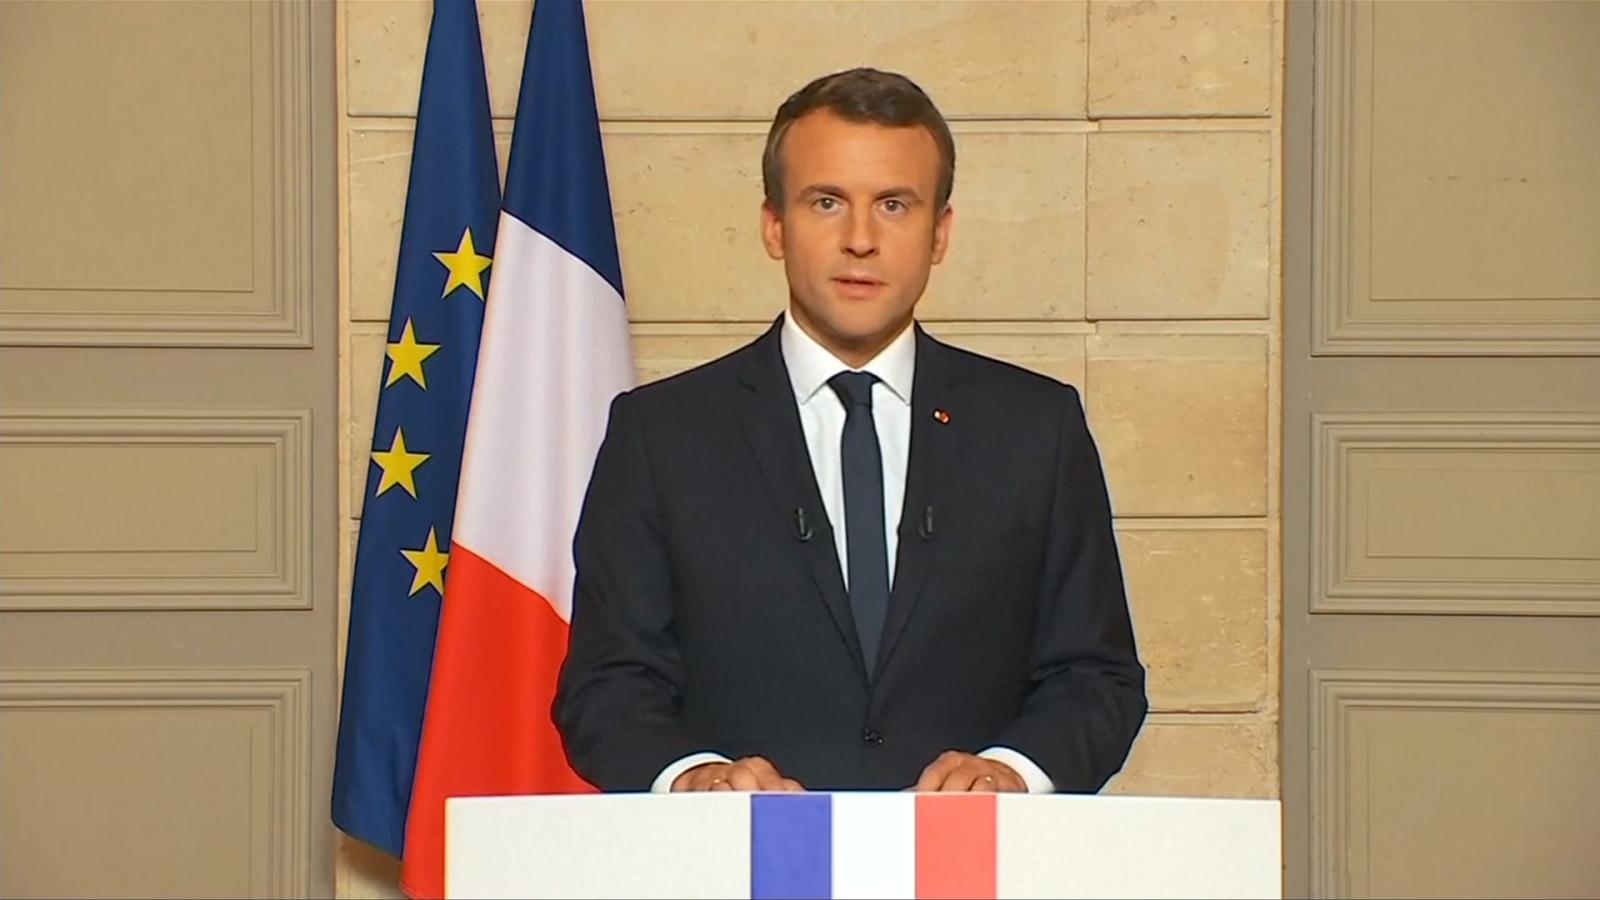 French President Macron: